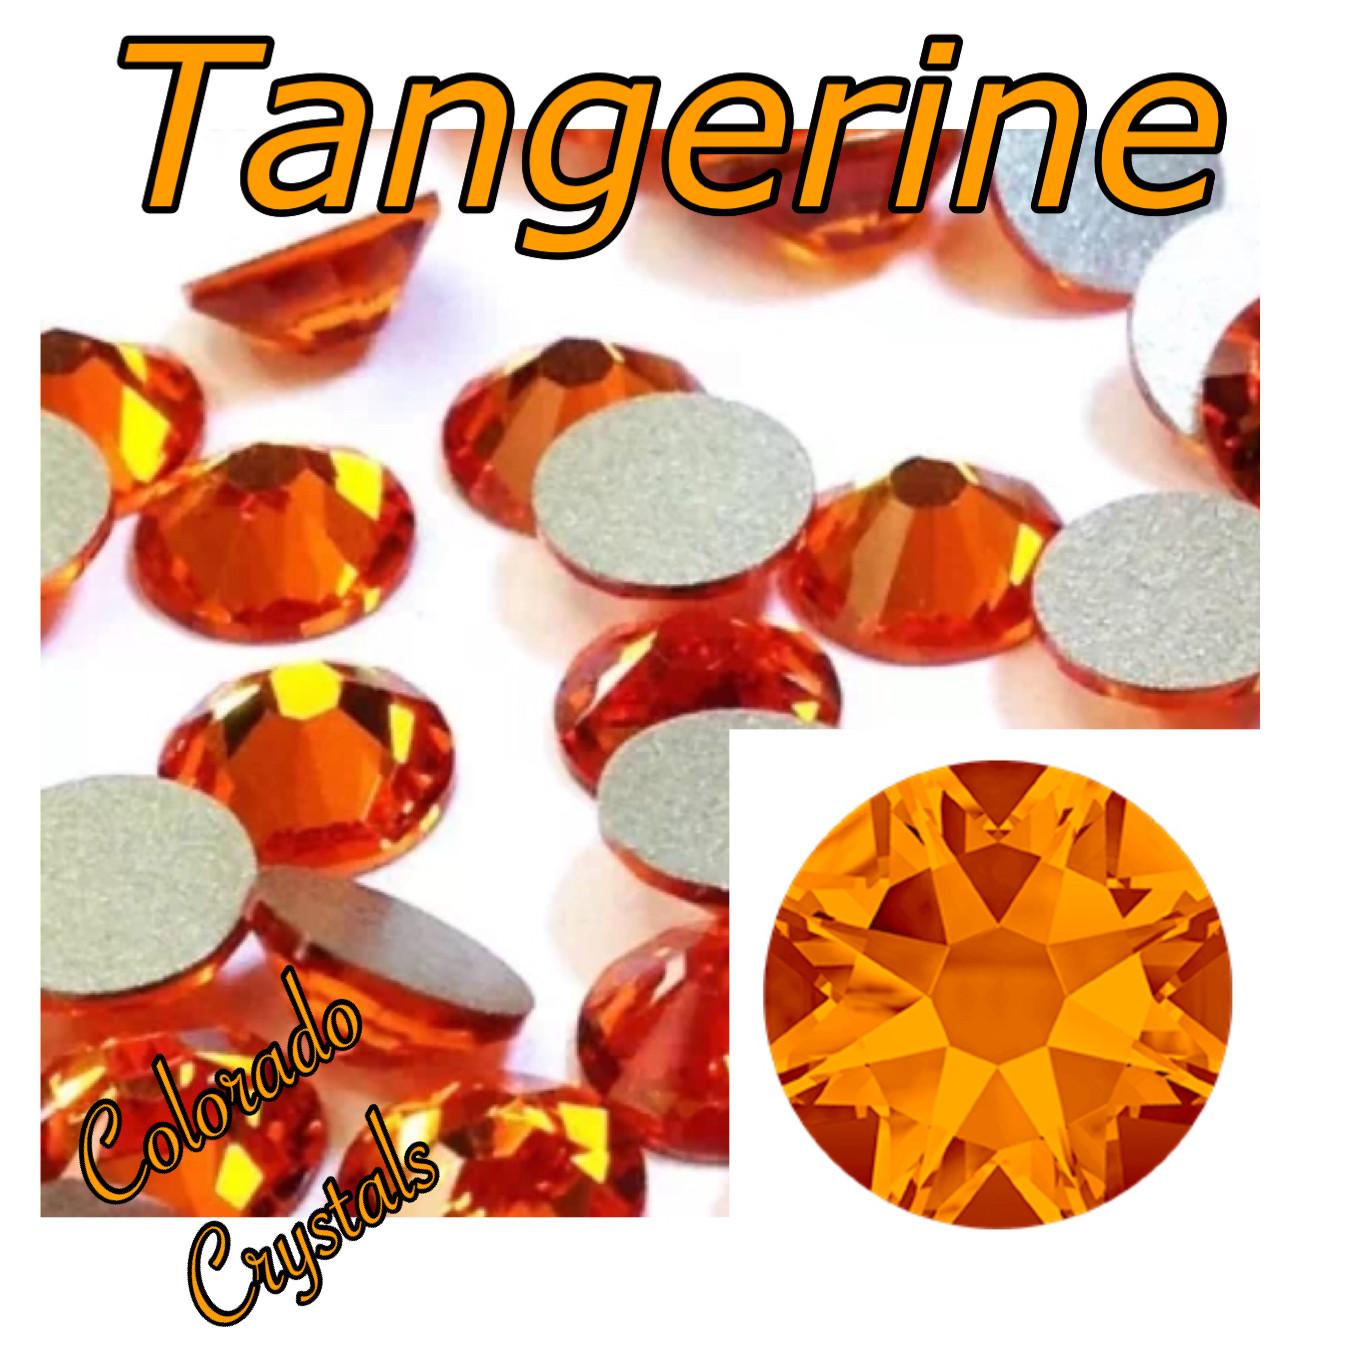 Tangerine 34ss 2088 Limited Swarovski Large flat back